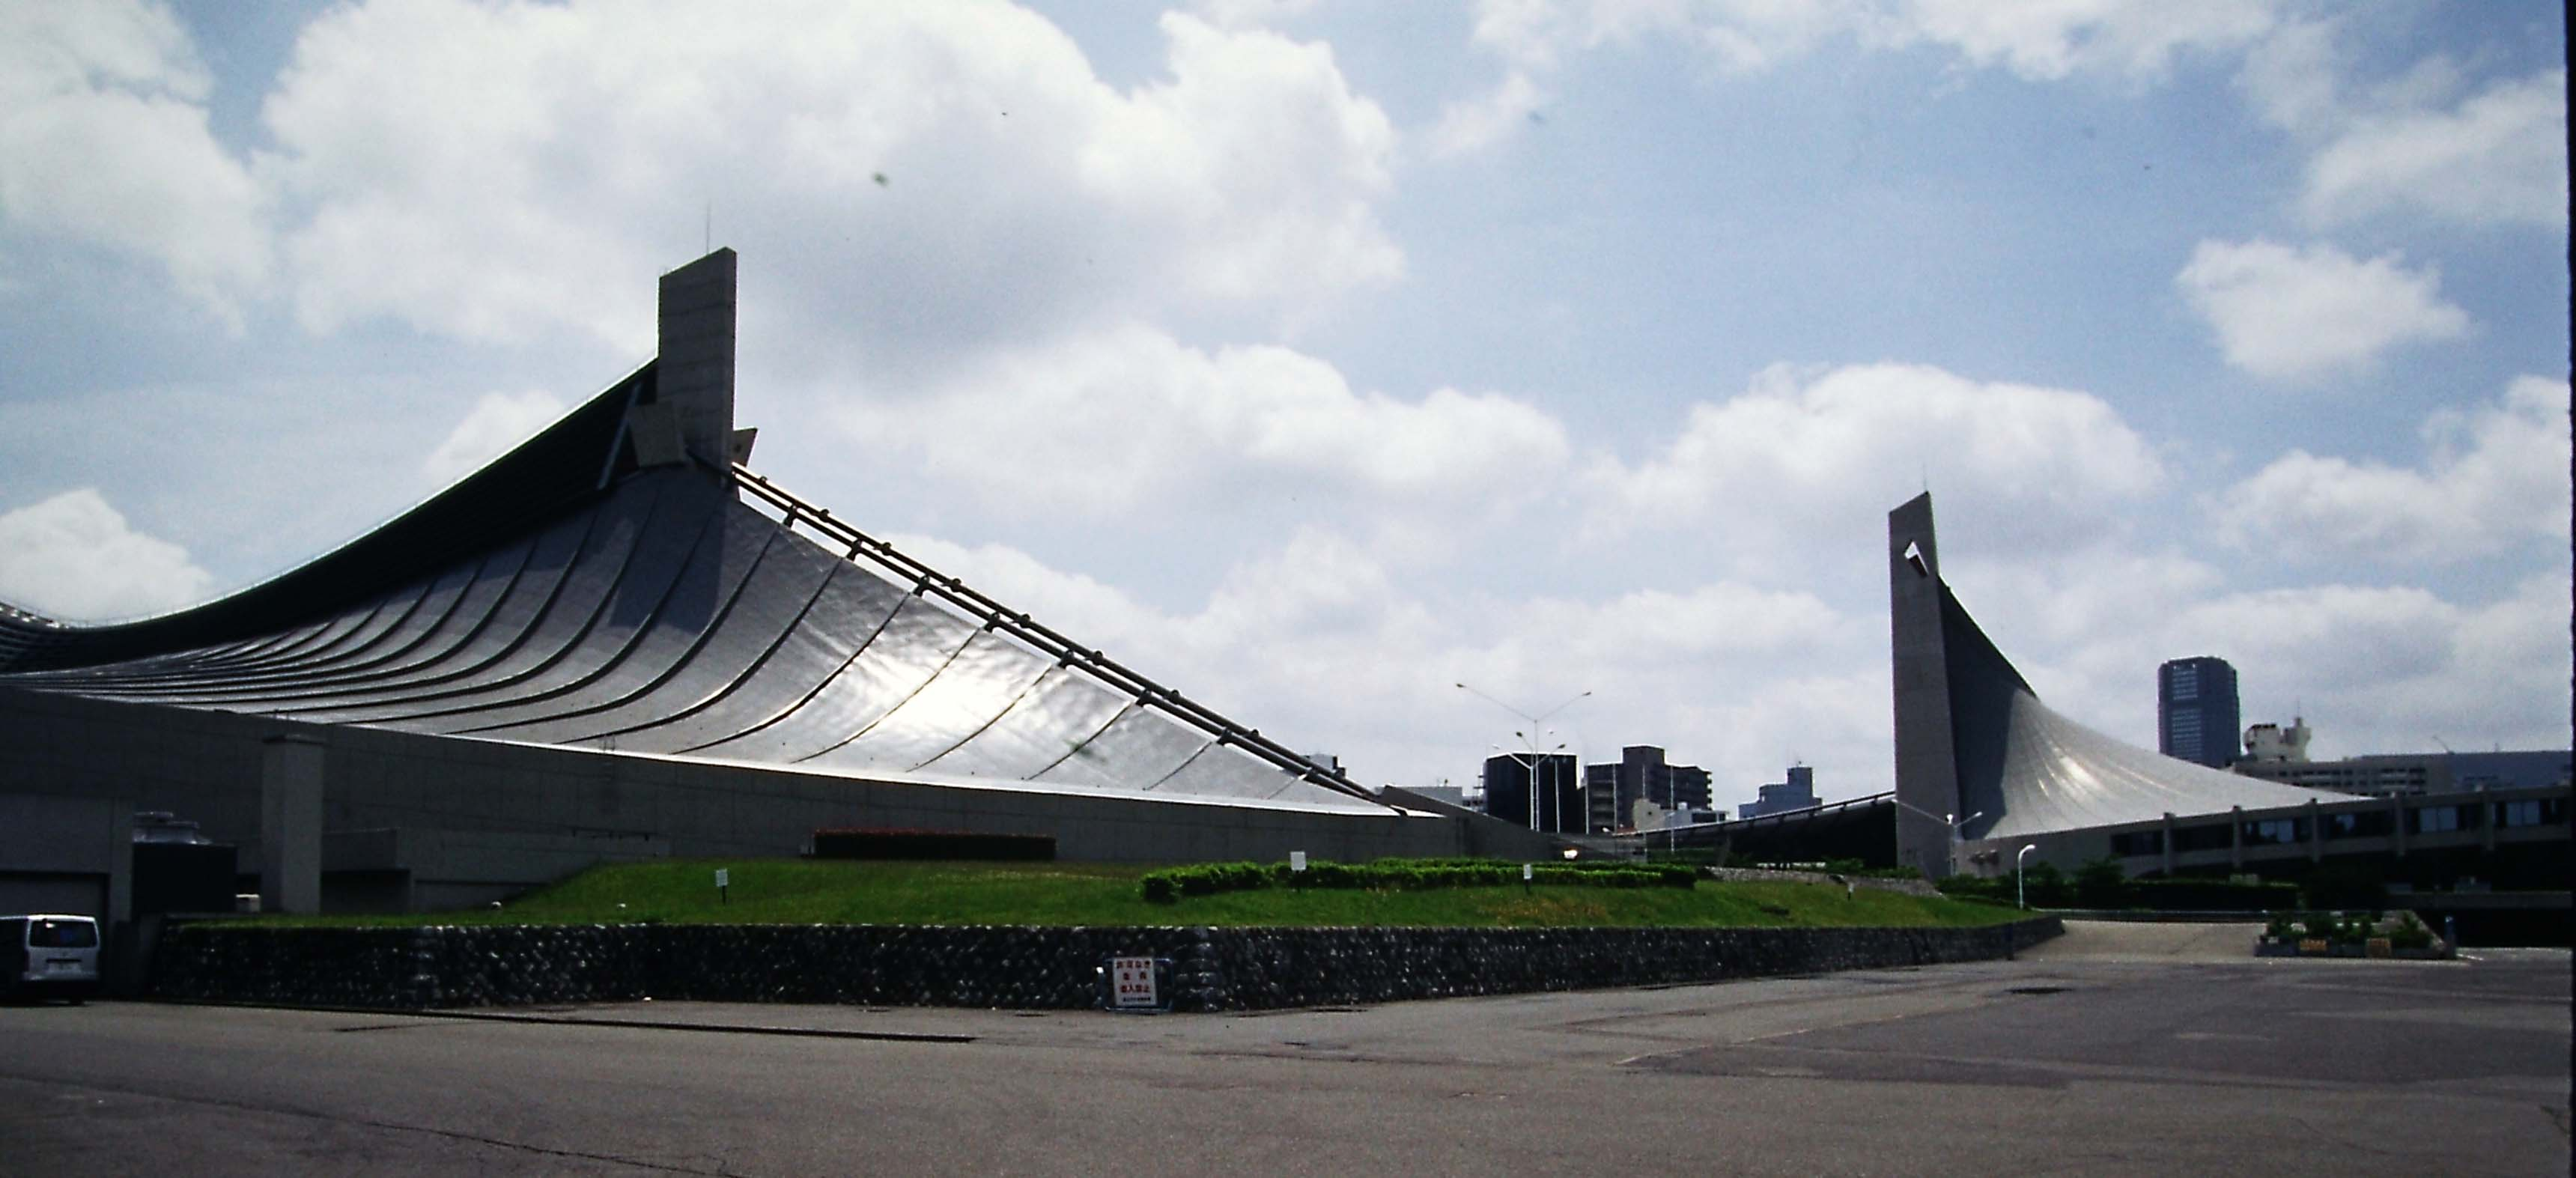 Kenzo Tange, National Gymnasiums for the Tokyo Olympics, 1964